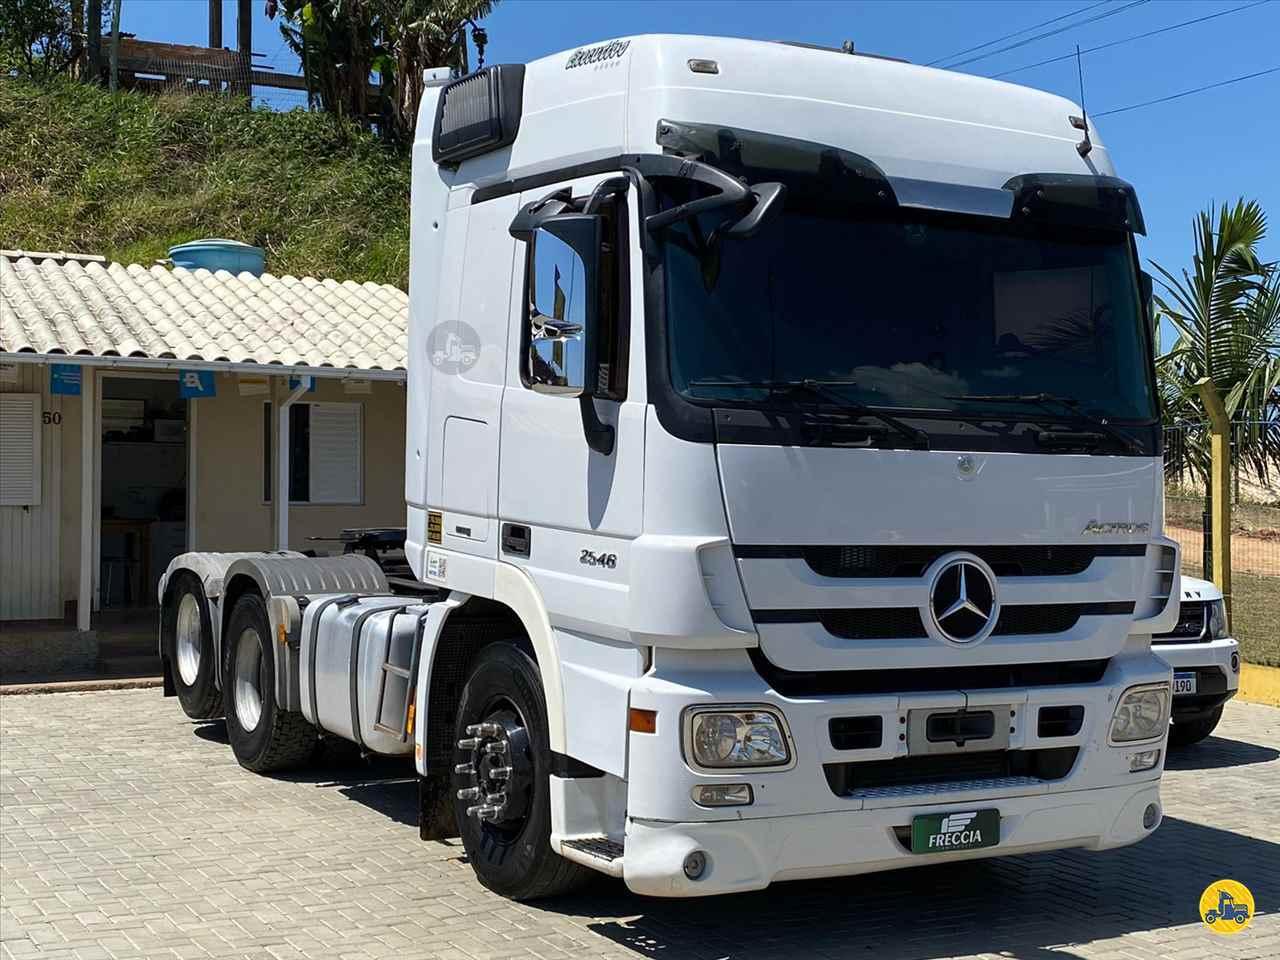 CAMINHAO MERCEDES-BENZ MB 2546 Cavalo Mecânico Truck 6x2 Freccia Caminhões JAGUARUNA SANTA CATARINA SC